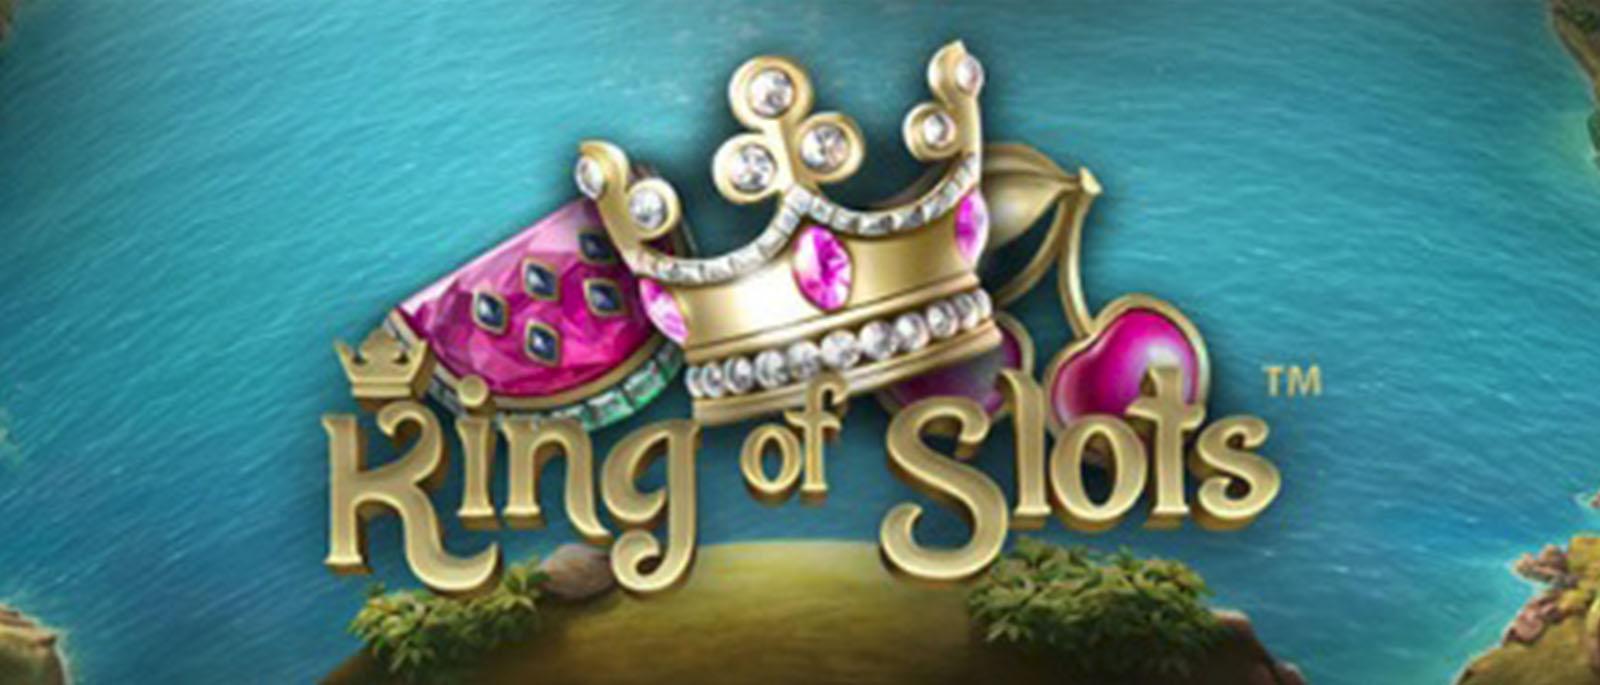 King Of Slots Spielautomat